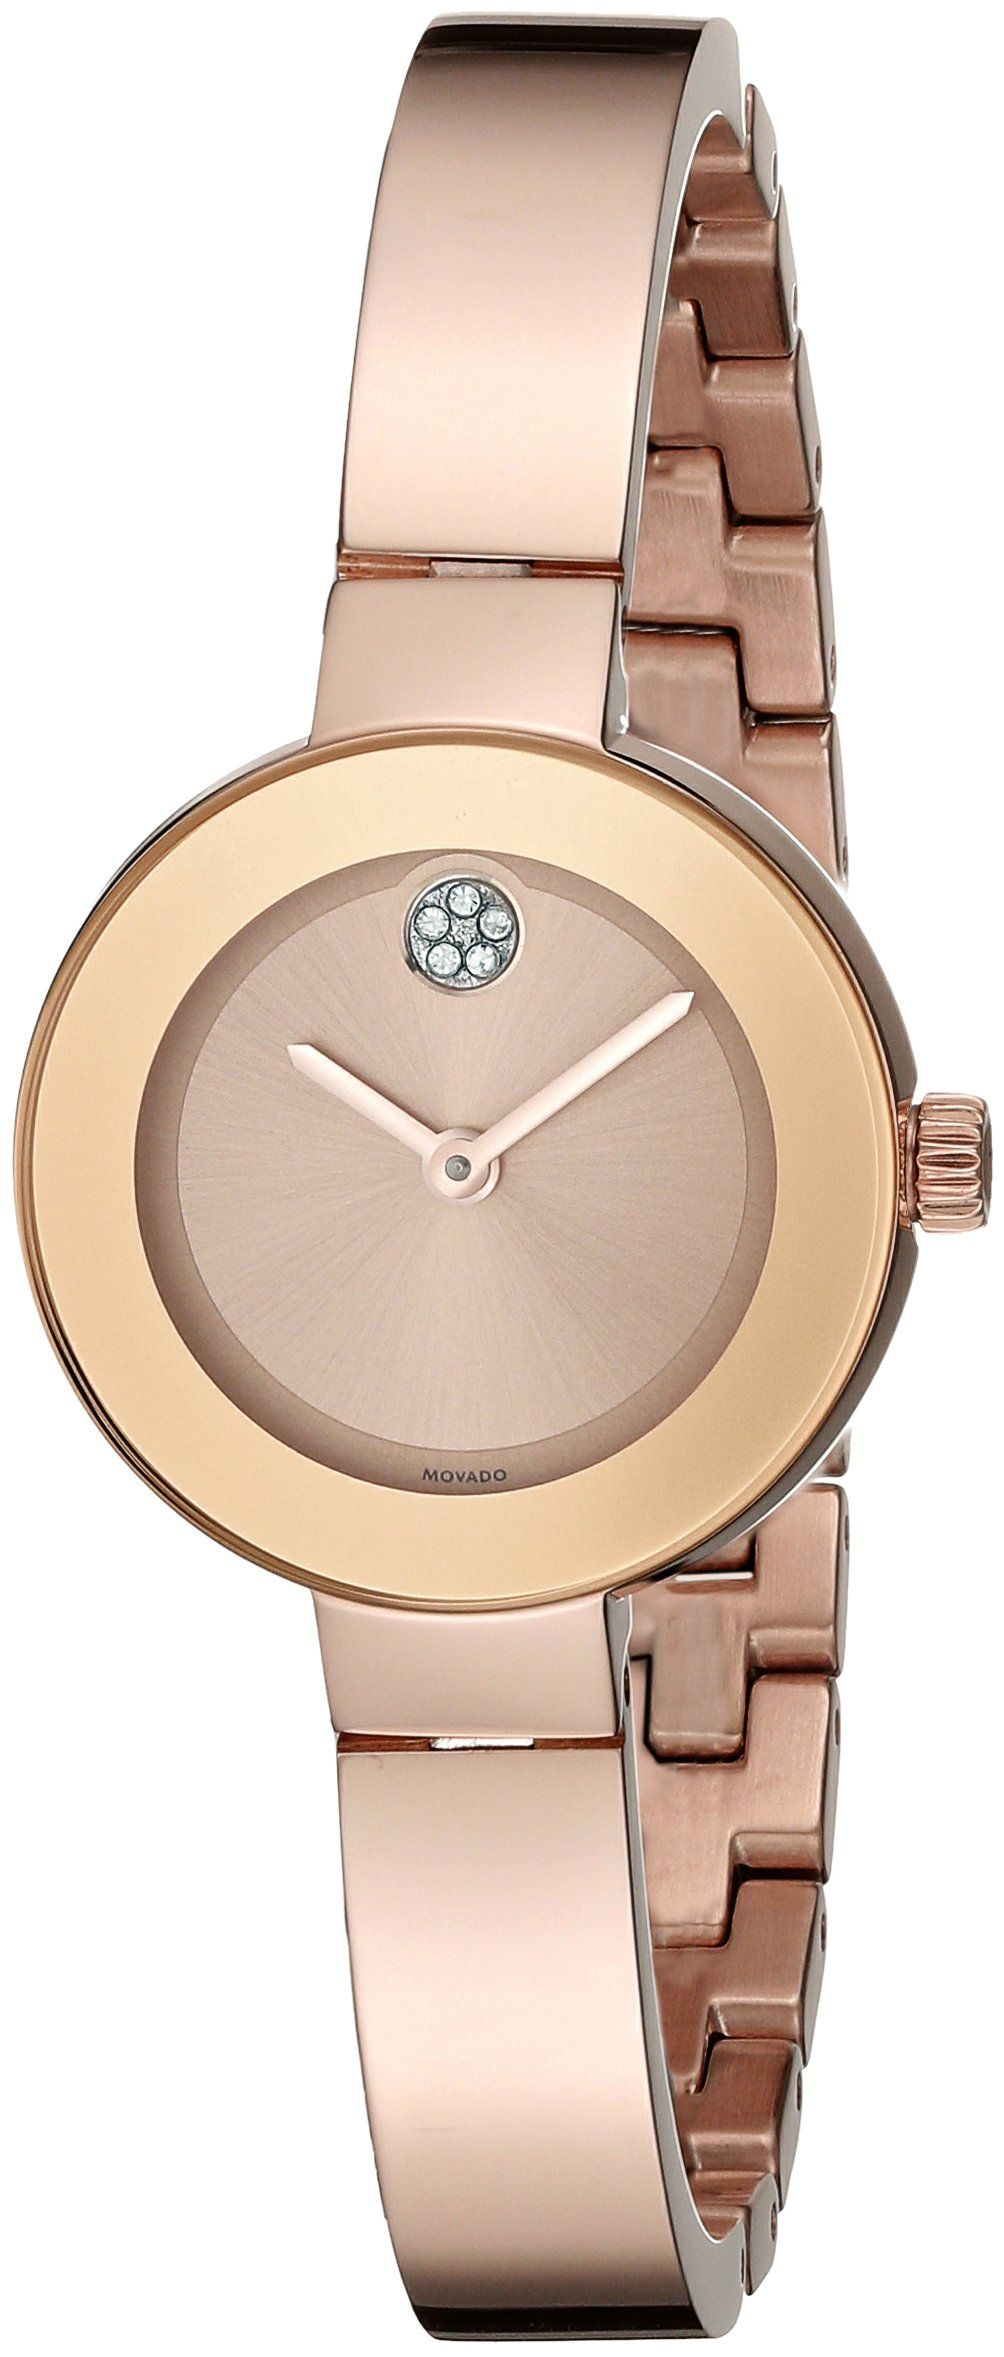 d4898172705 Amazon.com  Movado Women s 3600286 Rose Gold Watch with Swarovski Crystal  Accents  Watches. Óculos FemininoRelógios ...